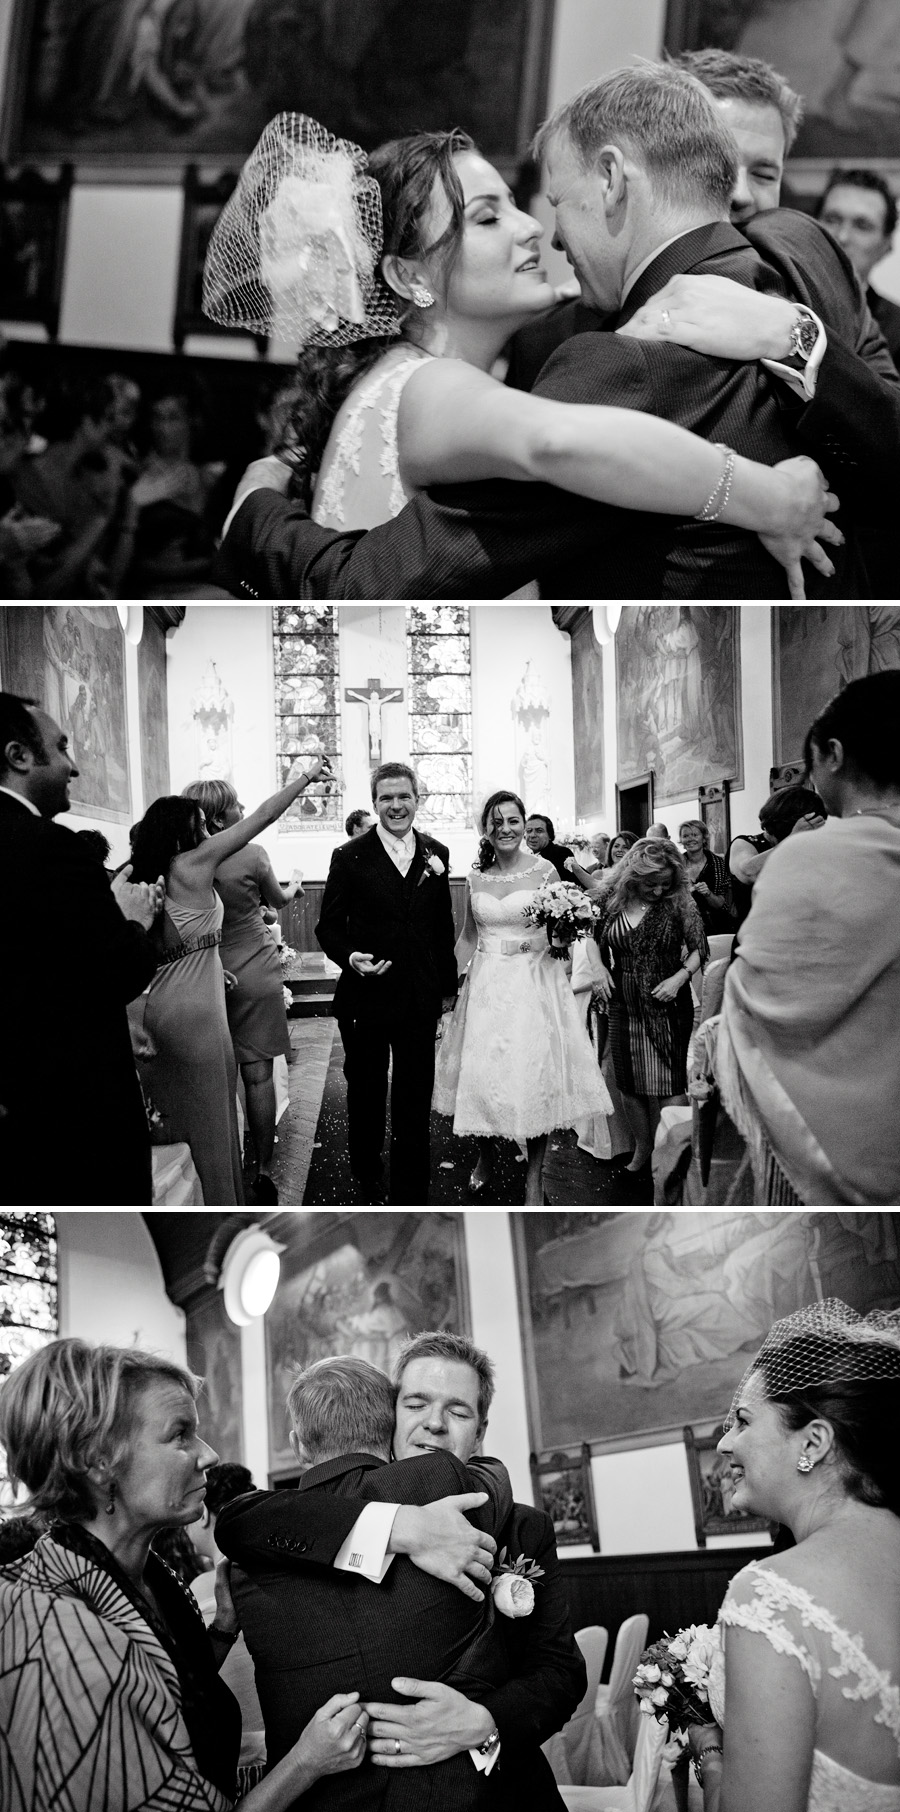 wedding photographer belgium 49 copie